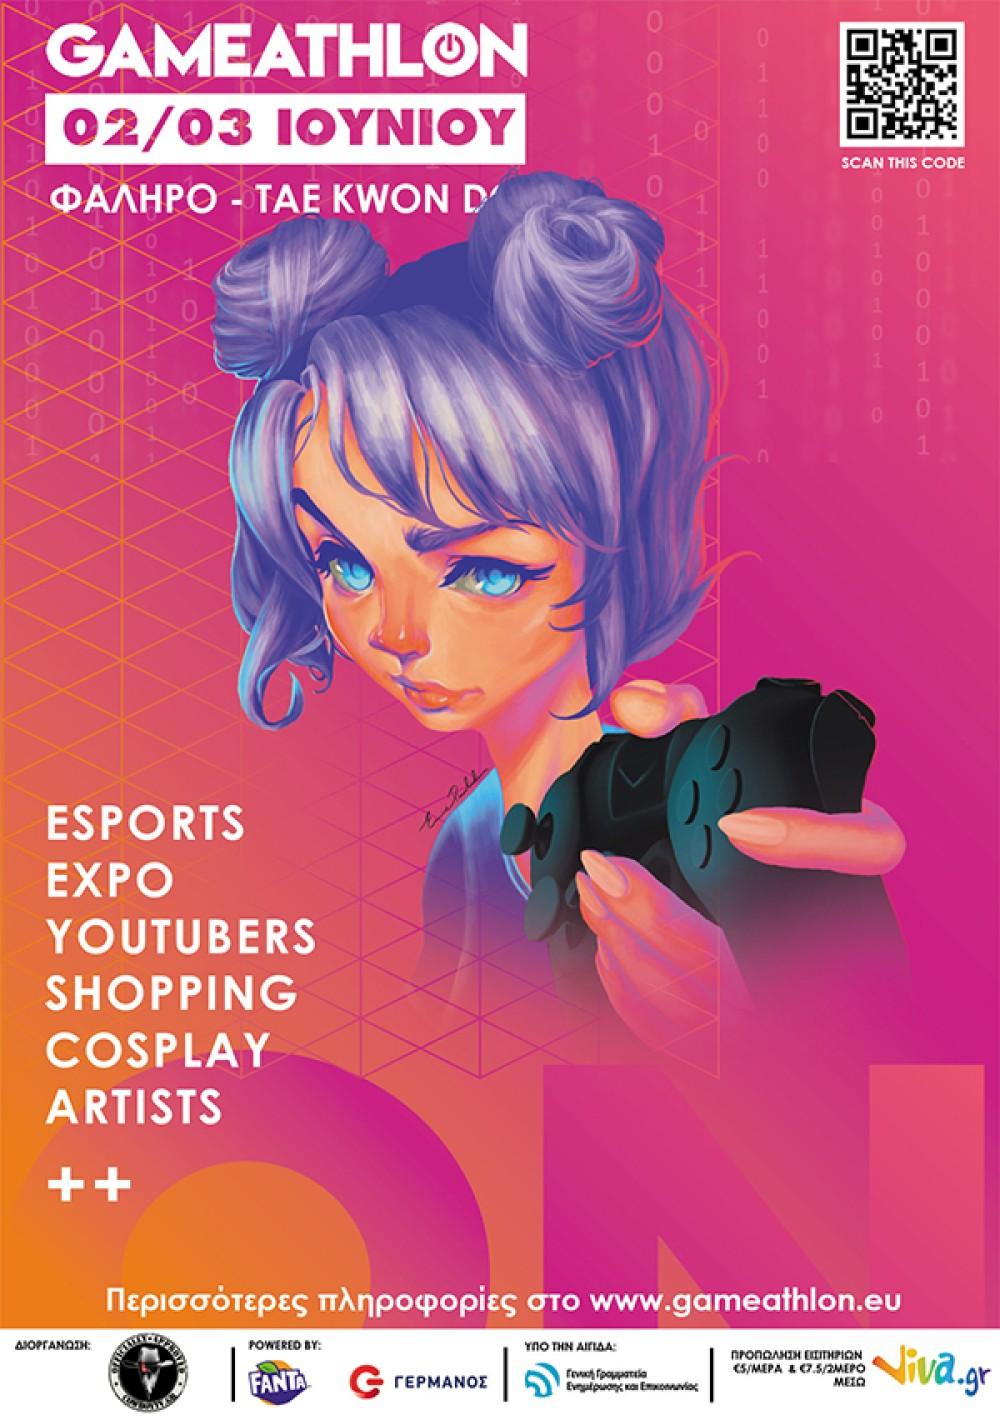 gameAthlon 2018: Το απόλυτο gaming event της Αθήνας έρχεται στις 2 και 3 Ιουνίου με την υποστήριξη της ΓΕΡΜΑΝΟΣ